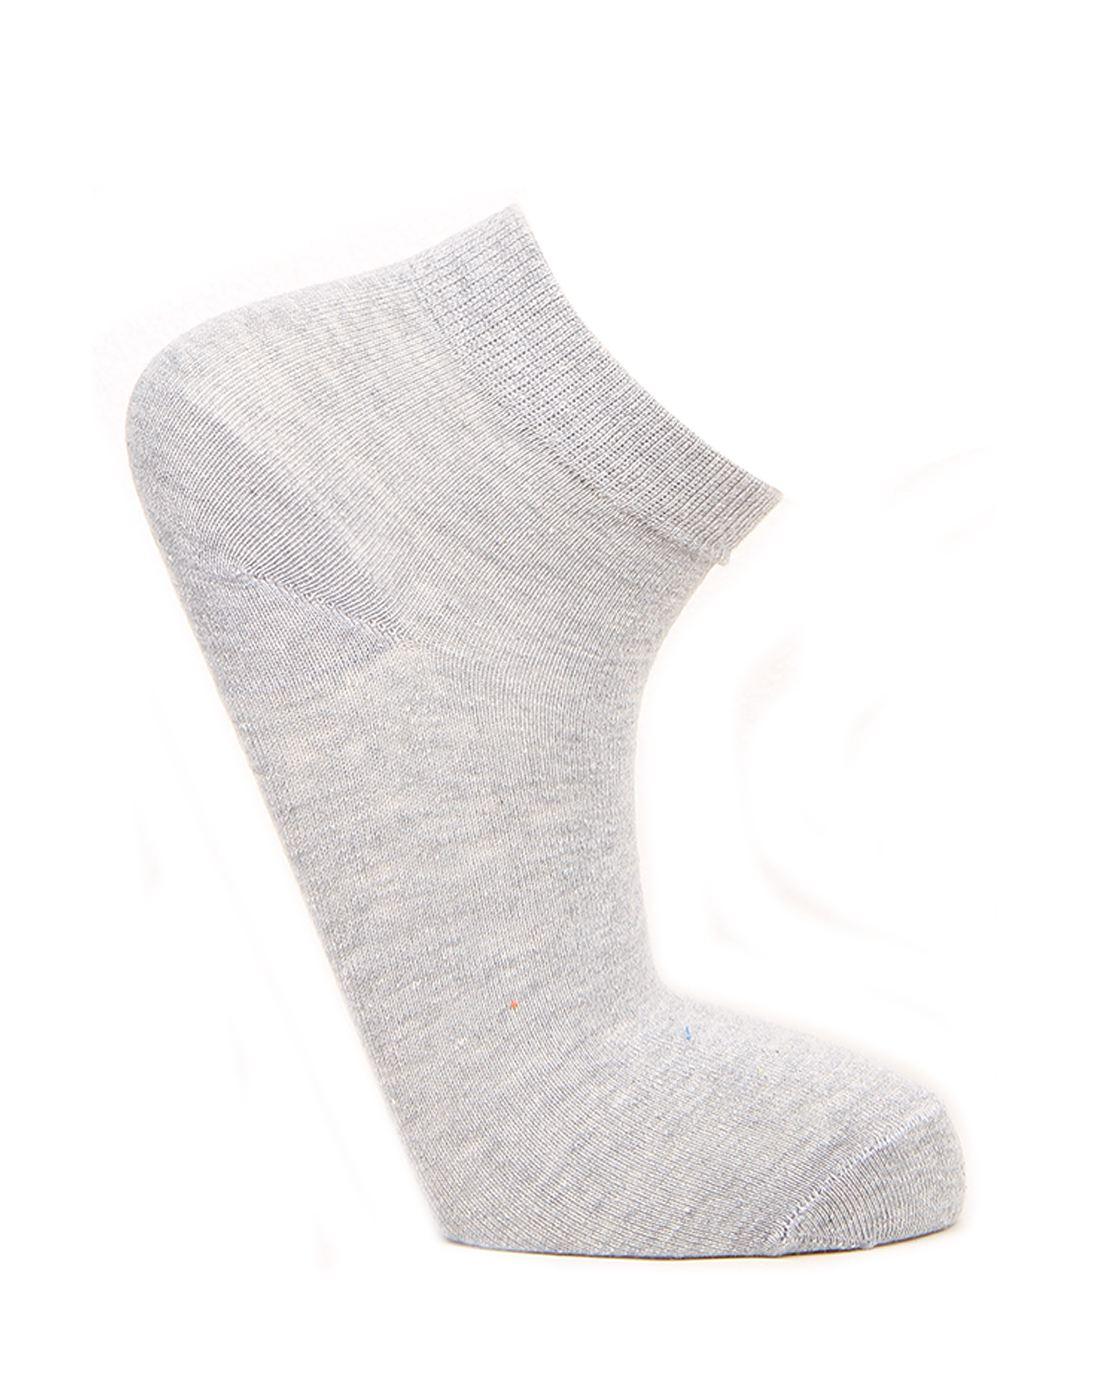 Norman Todd Women Grey Ankle Length Socks